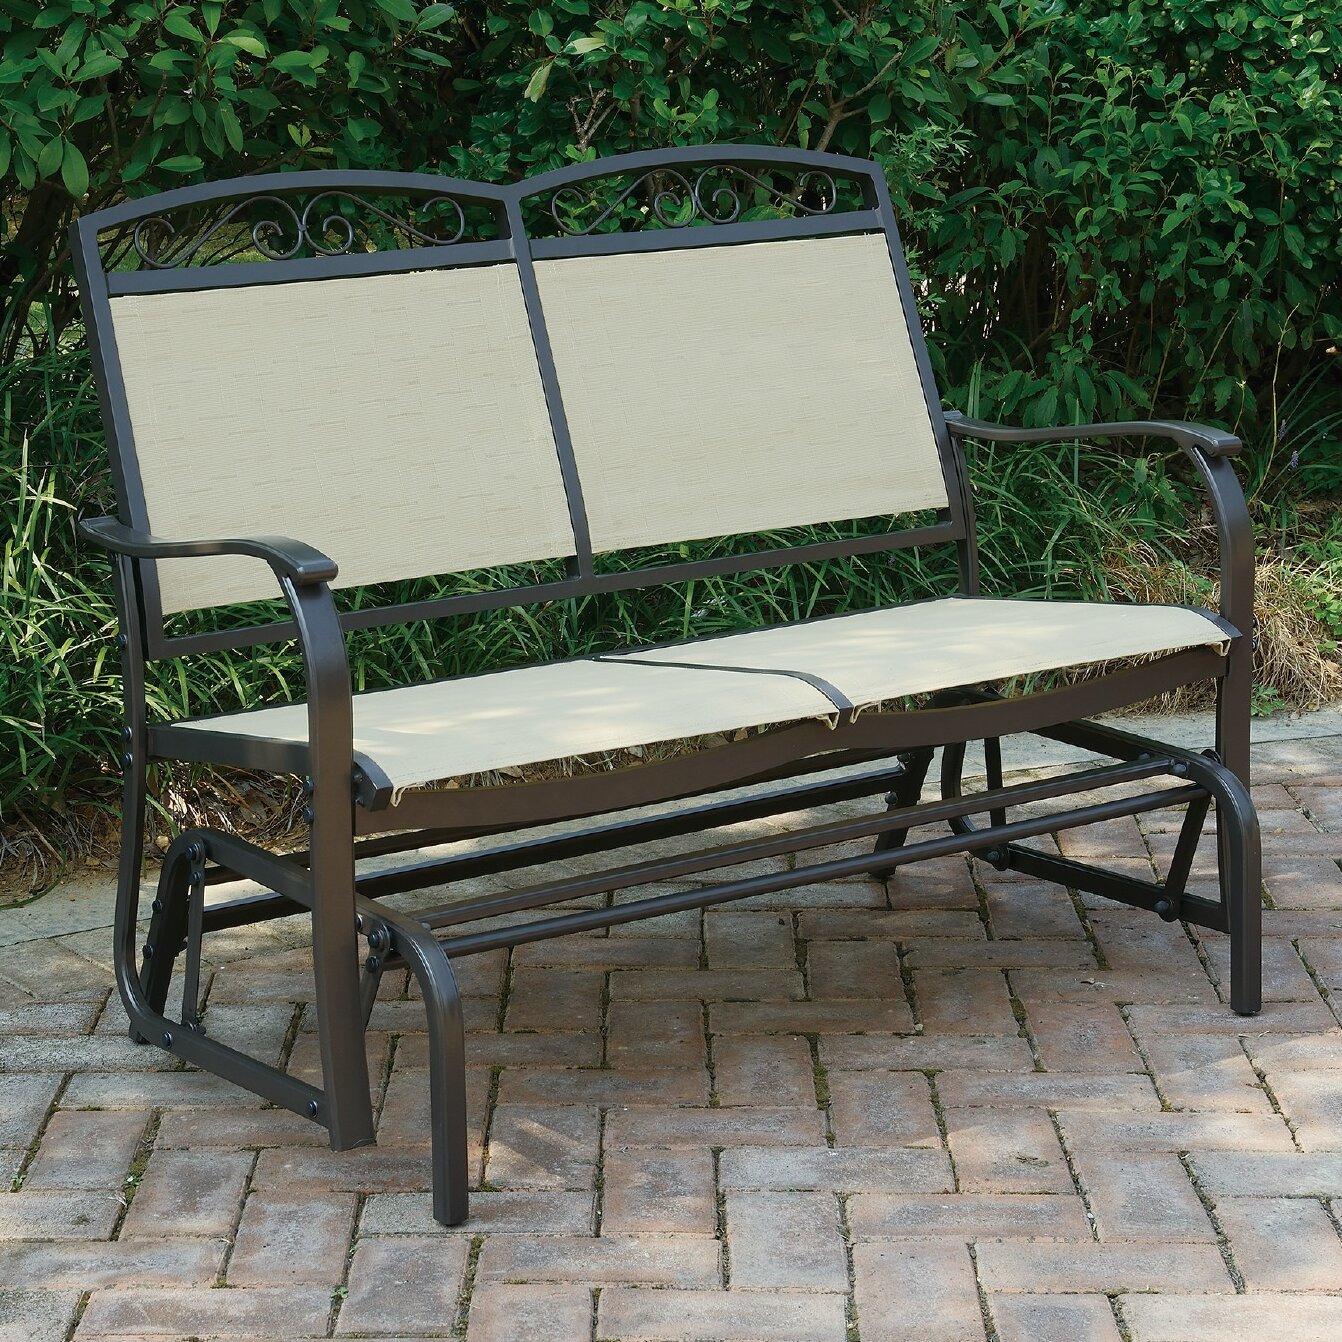 Wayzata Outdoor Fabric Glider Bench Intended For Outdoor Fabric Glider Benches (View 5 of 25)